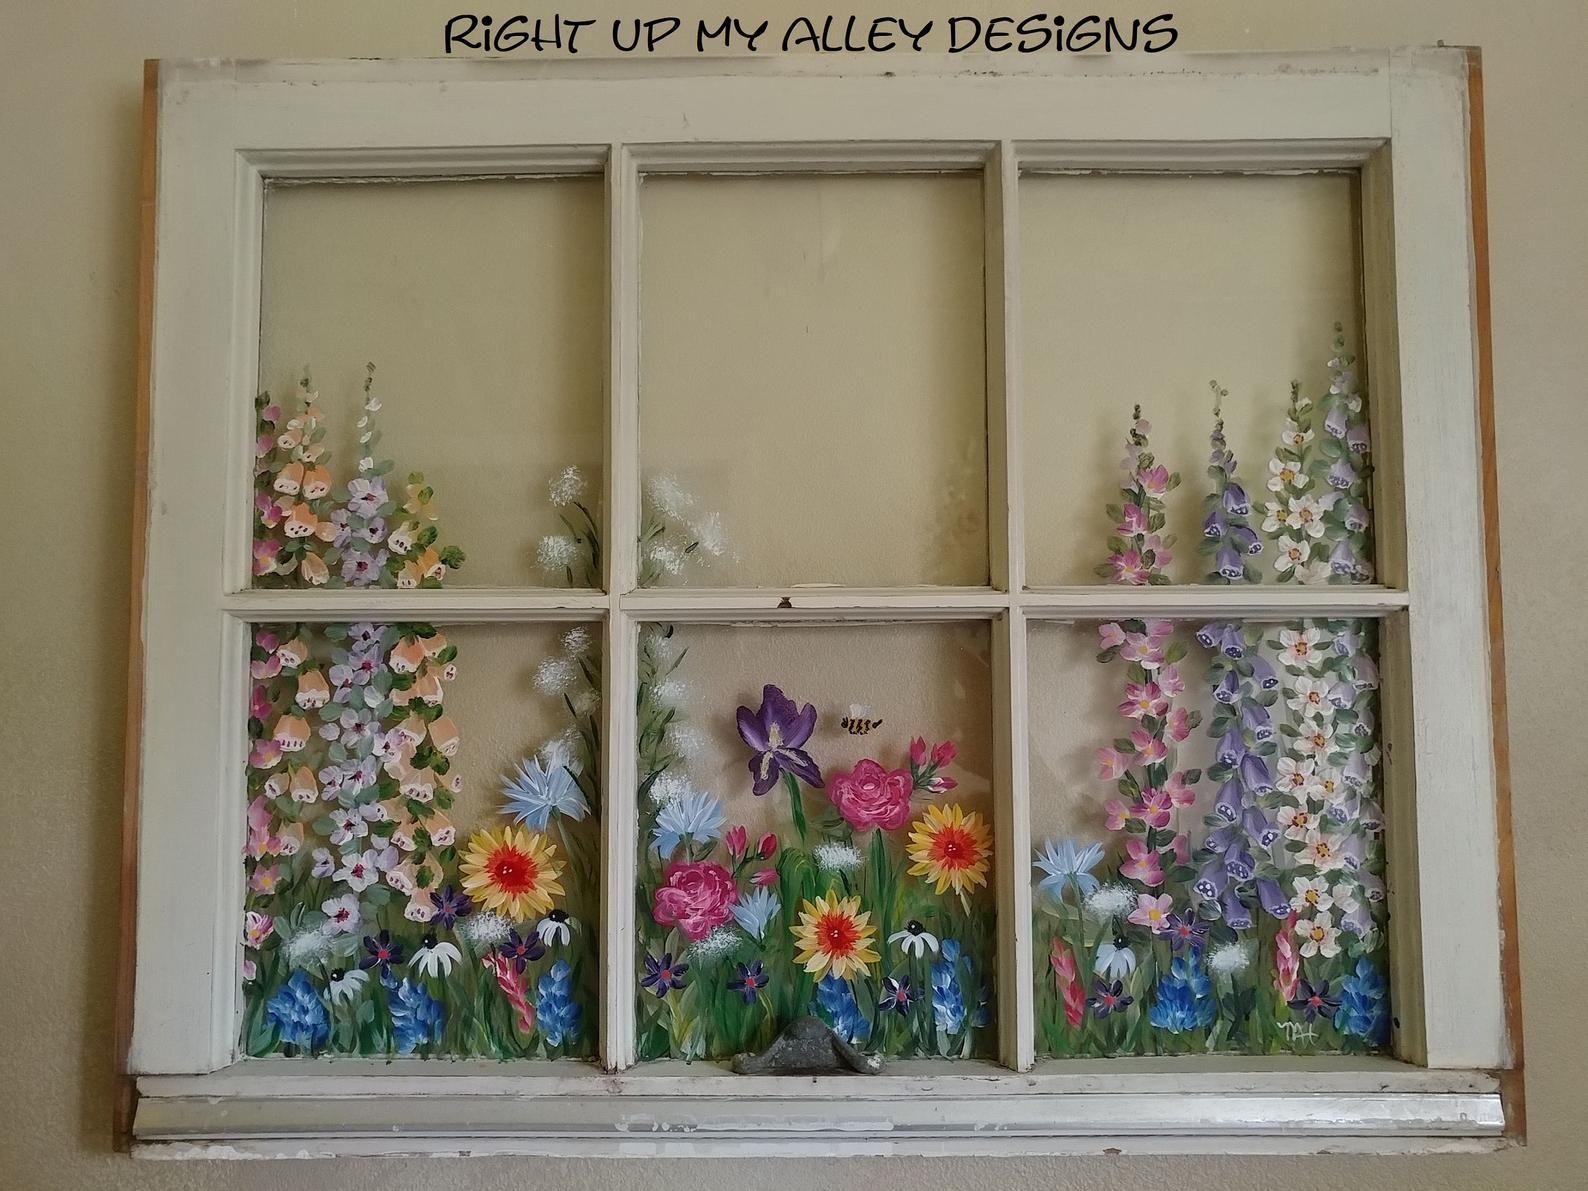 Painted window ideas from custom orders, Window pane art ideas ...